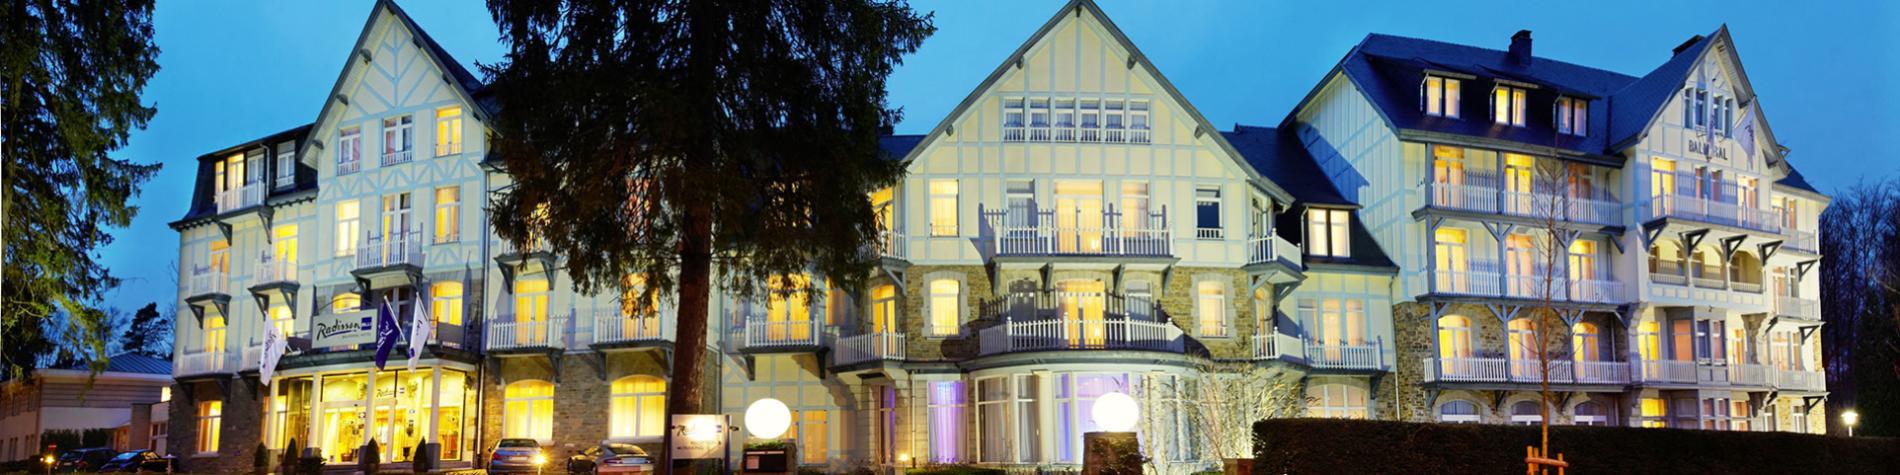 Radisson - Blu Balmoral - Hotel - Spa